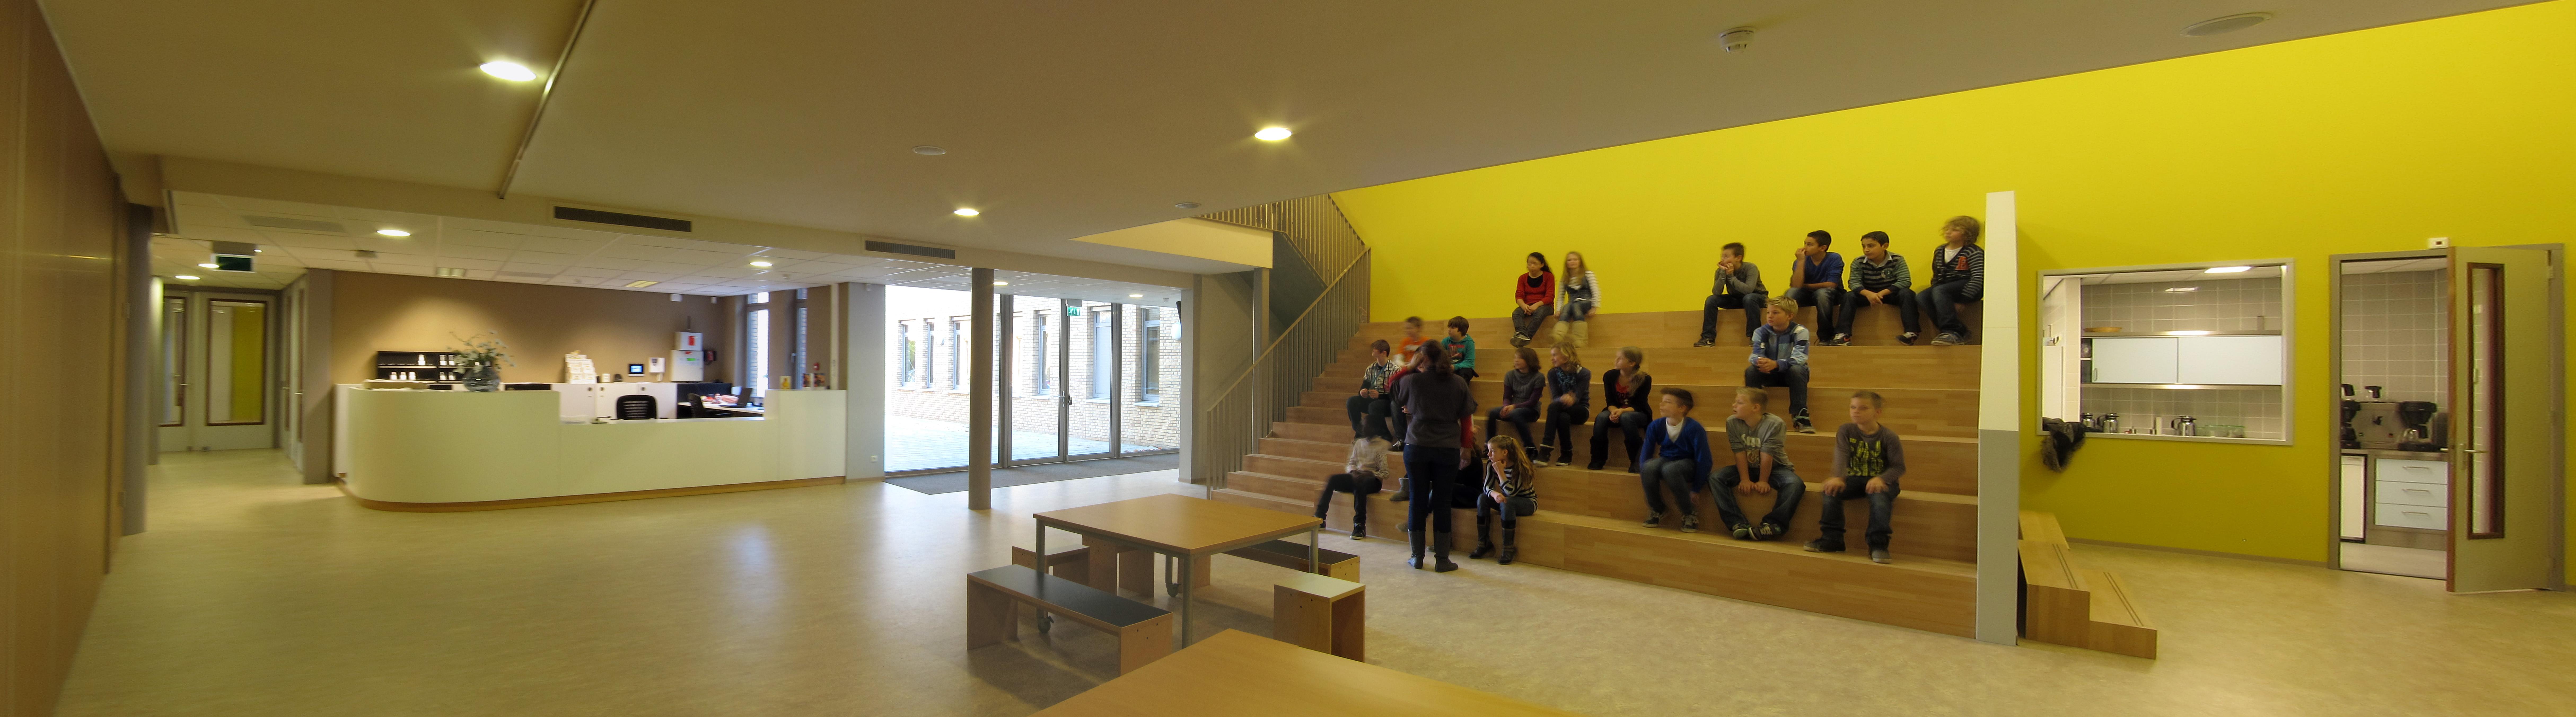 Kindcentrum Prins Willem Alexander - De Architect